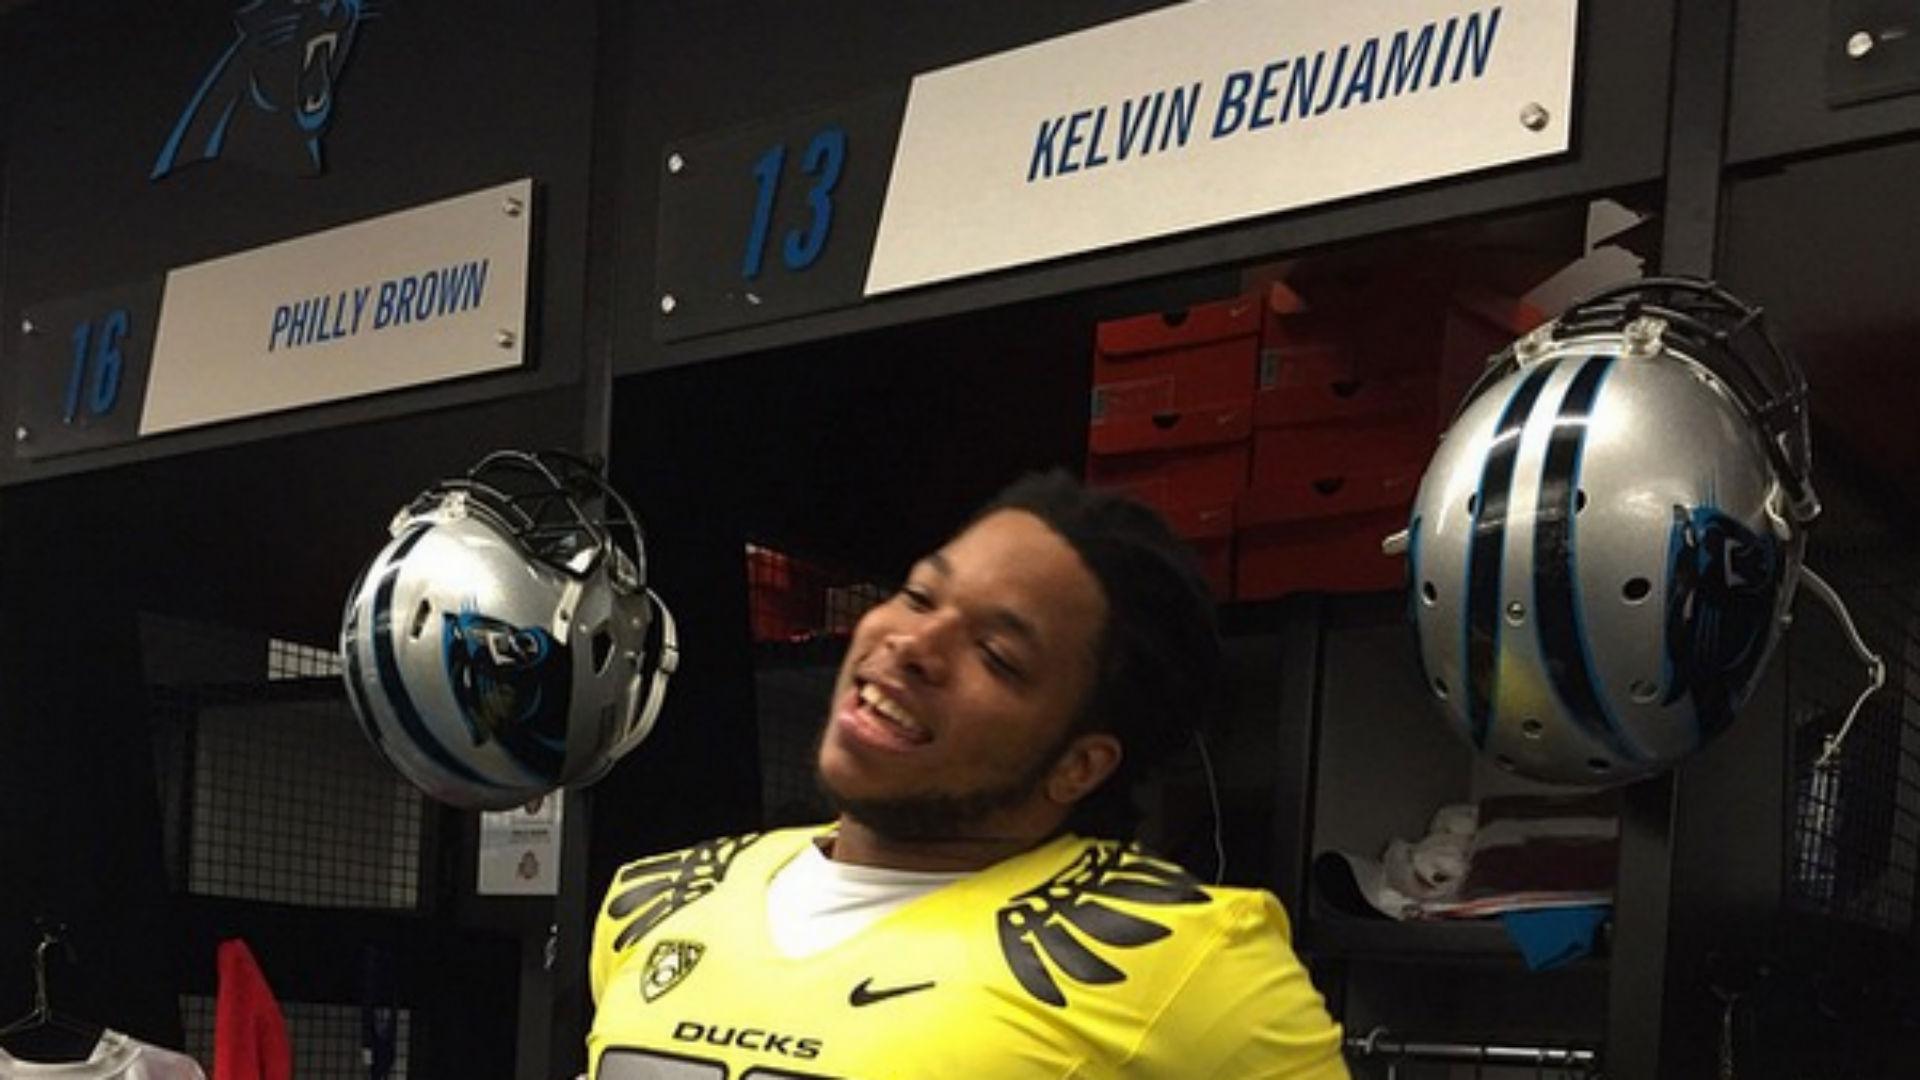 Wholesale NFL Jerseys cheap - Panthers' Kelvin Benjamin loses bet, sports Oregon jersey | NCAA ...